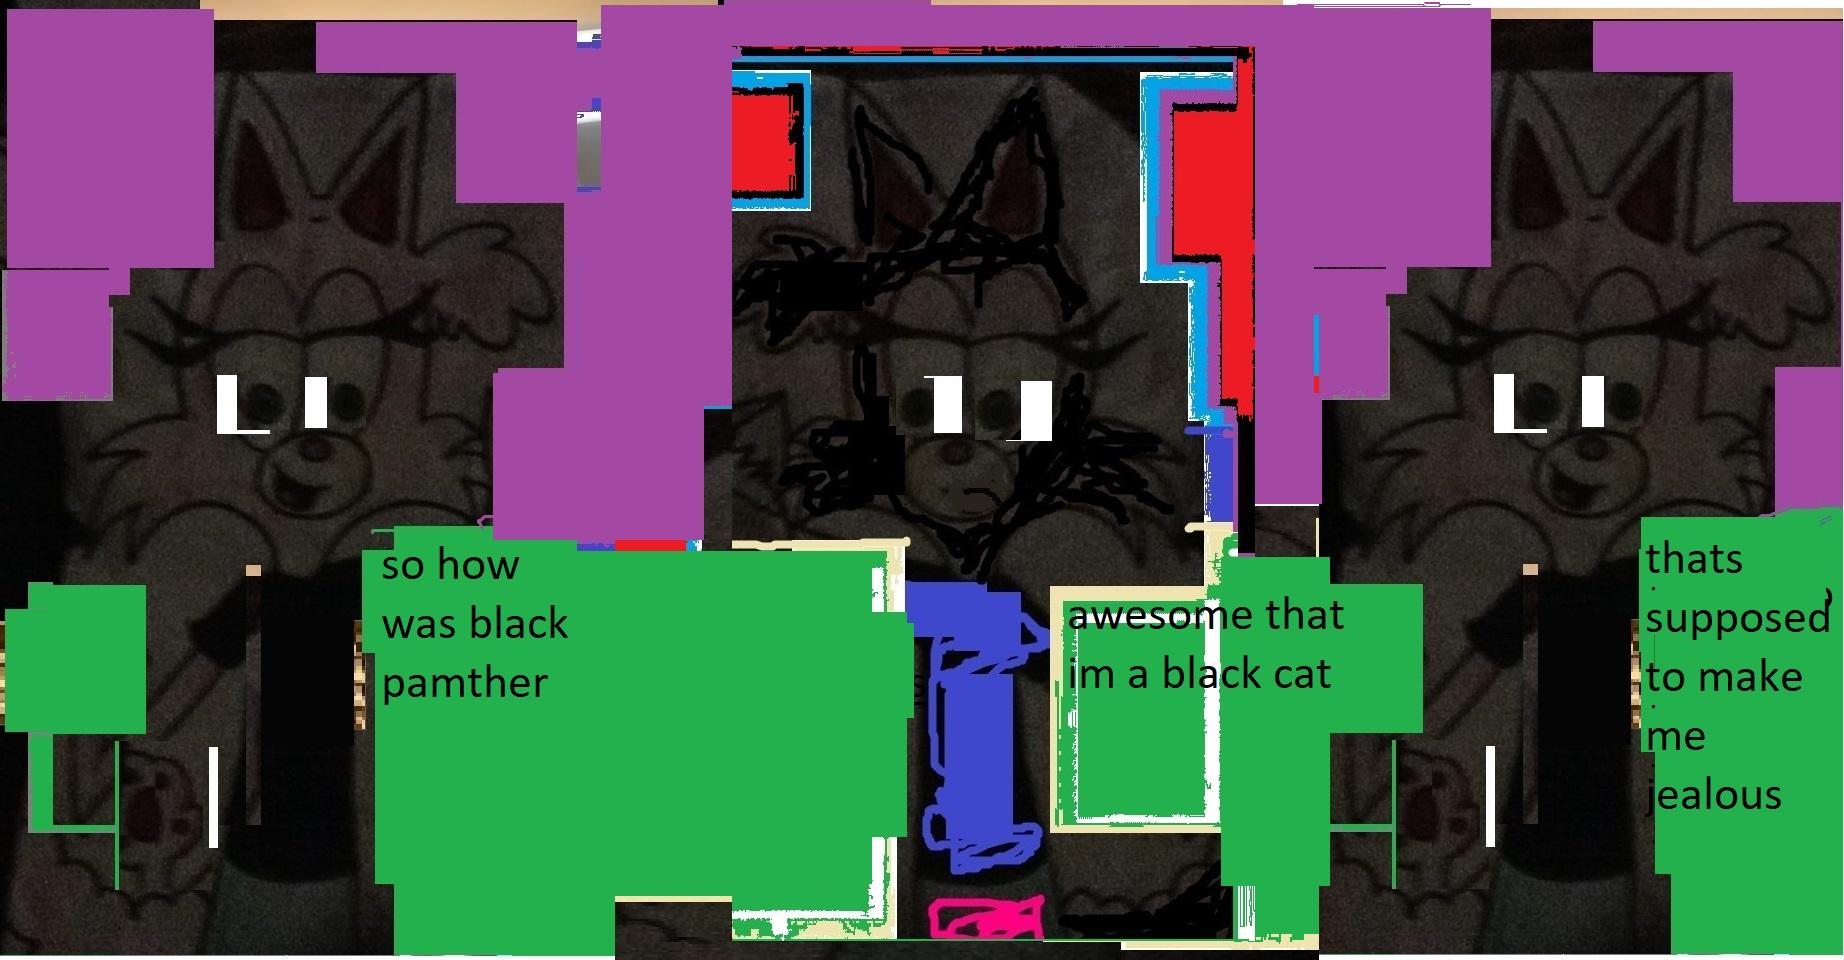 blackpather